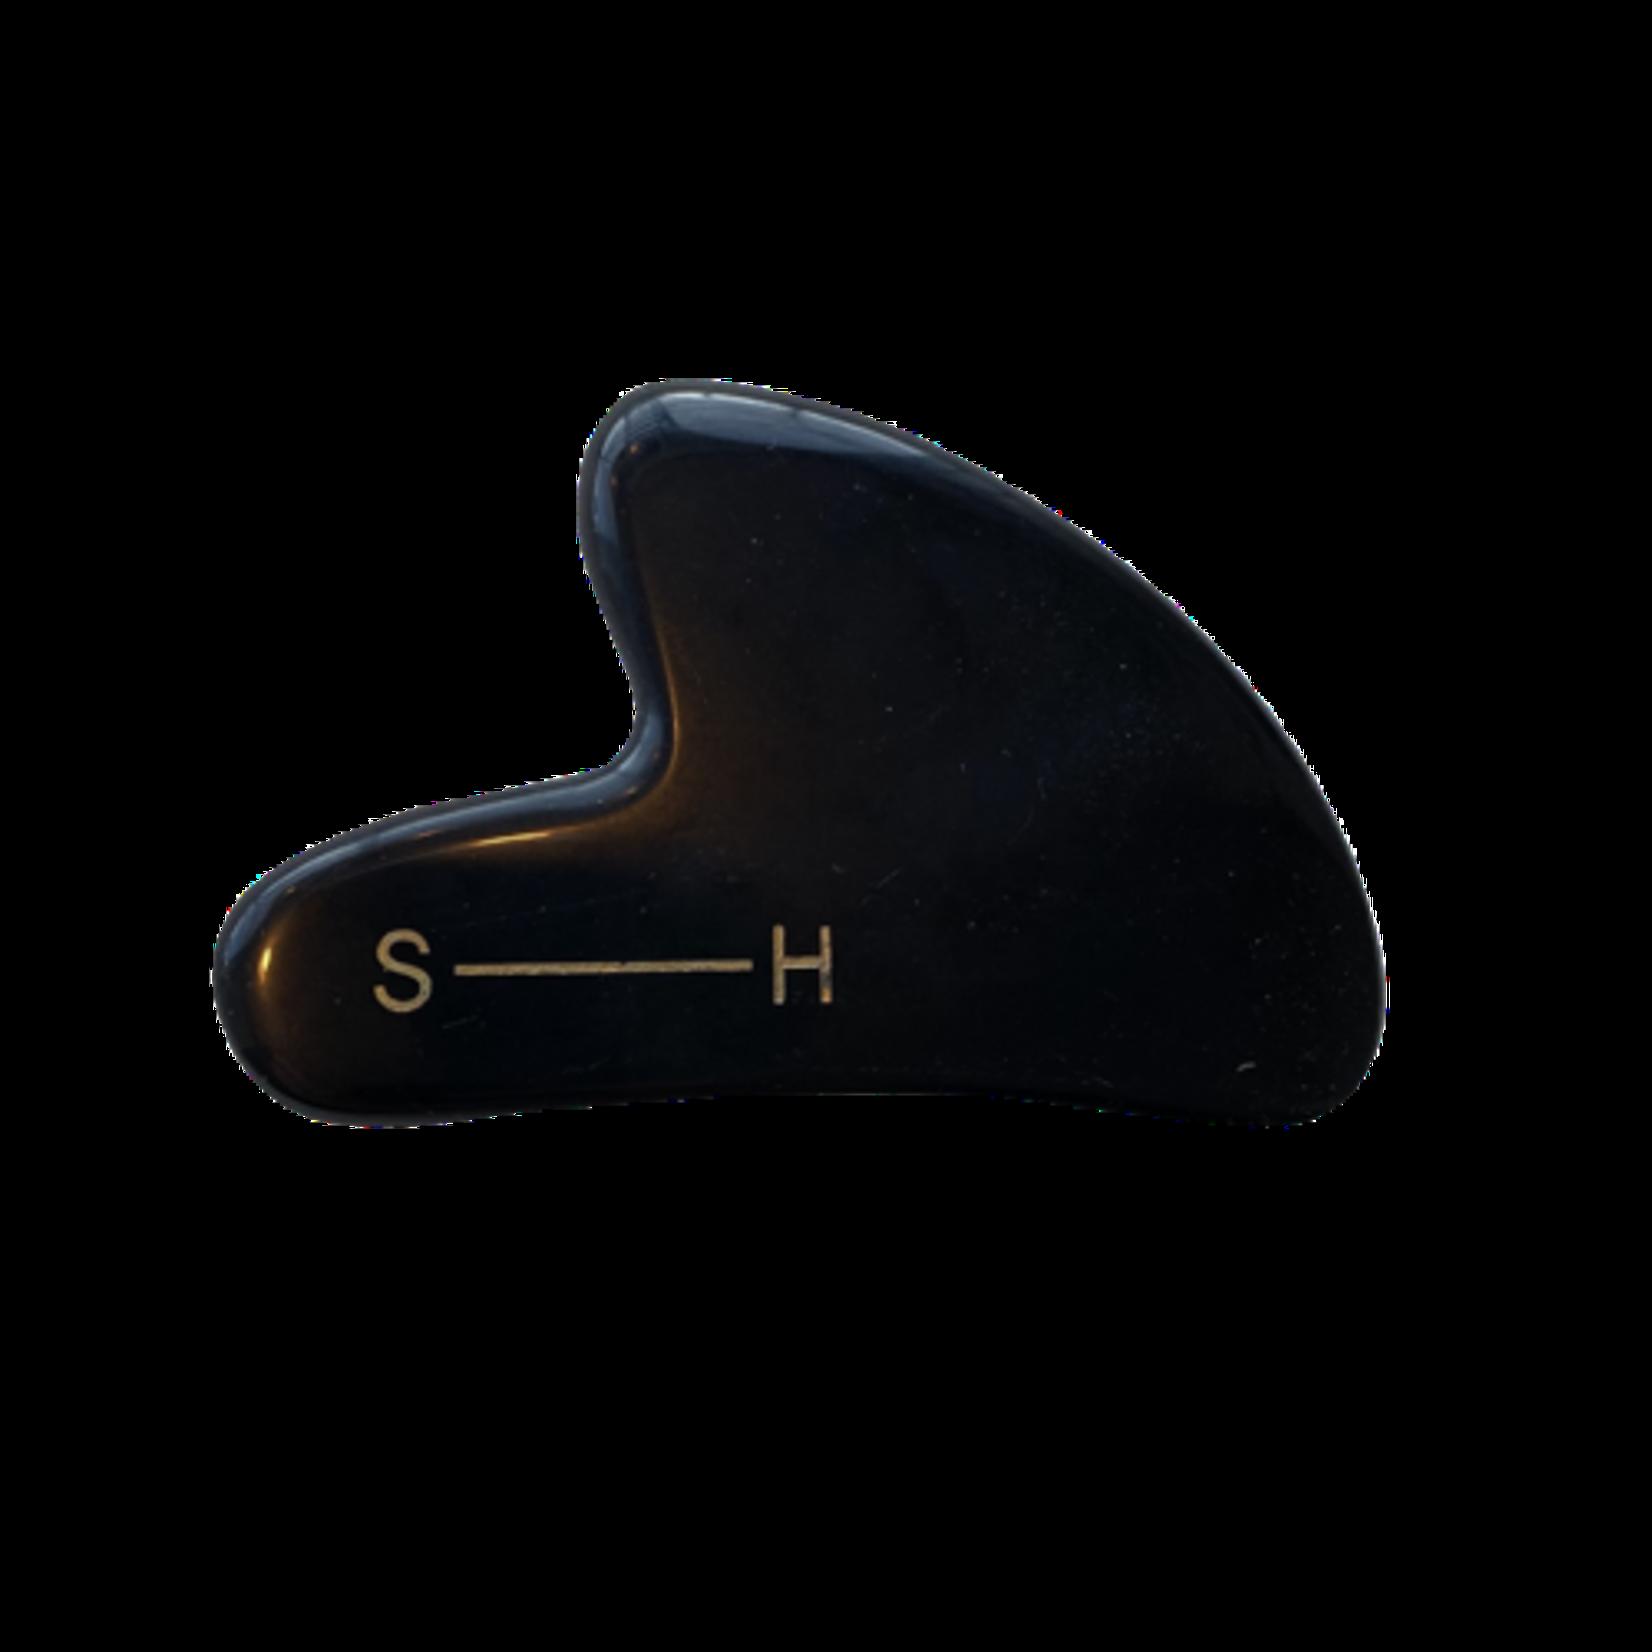 Le suppliher GUA SHA obsidienne